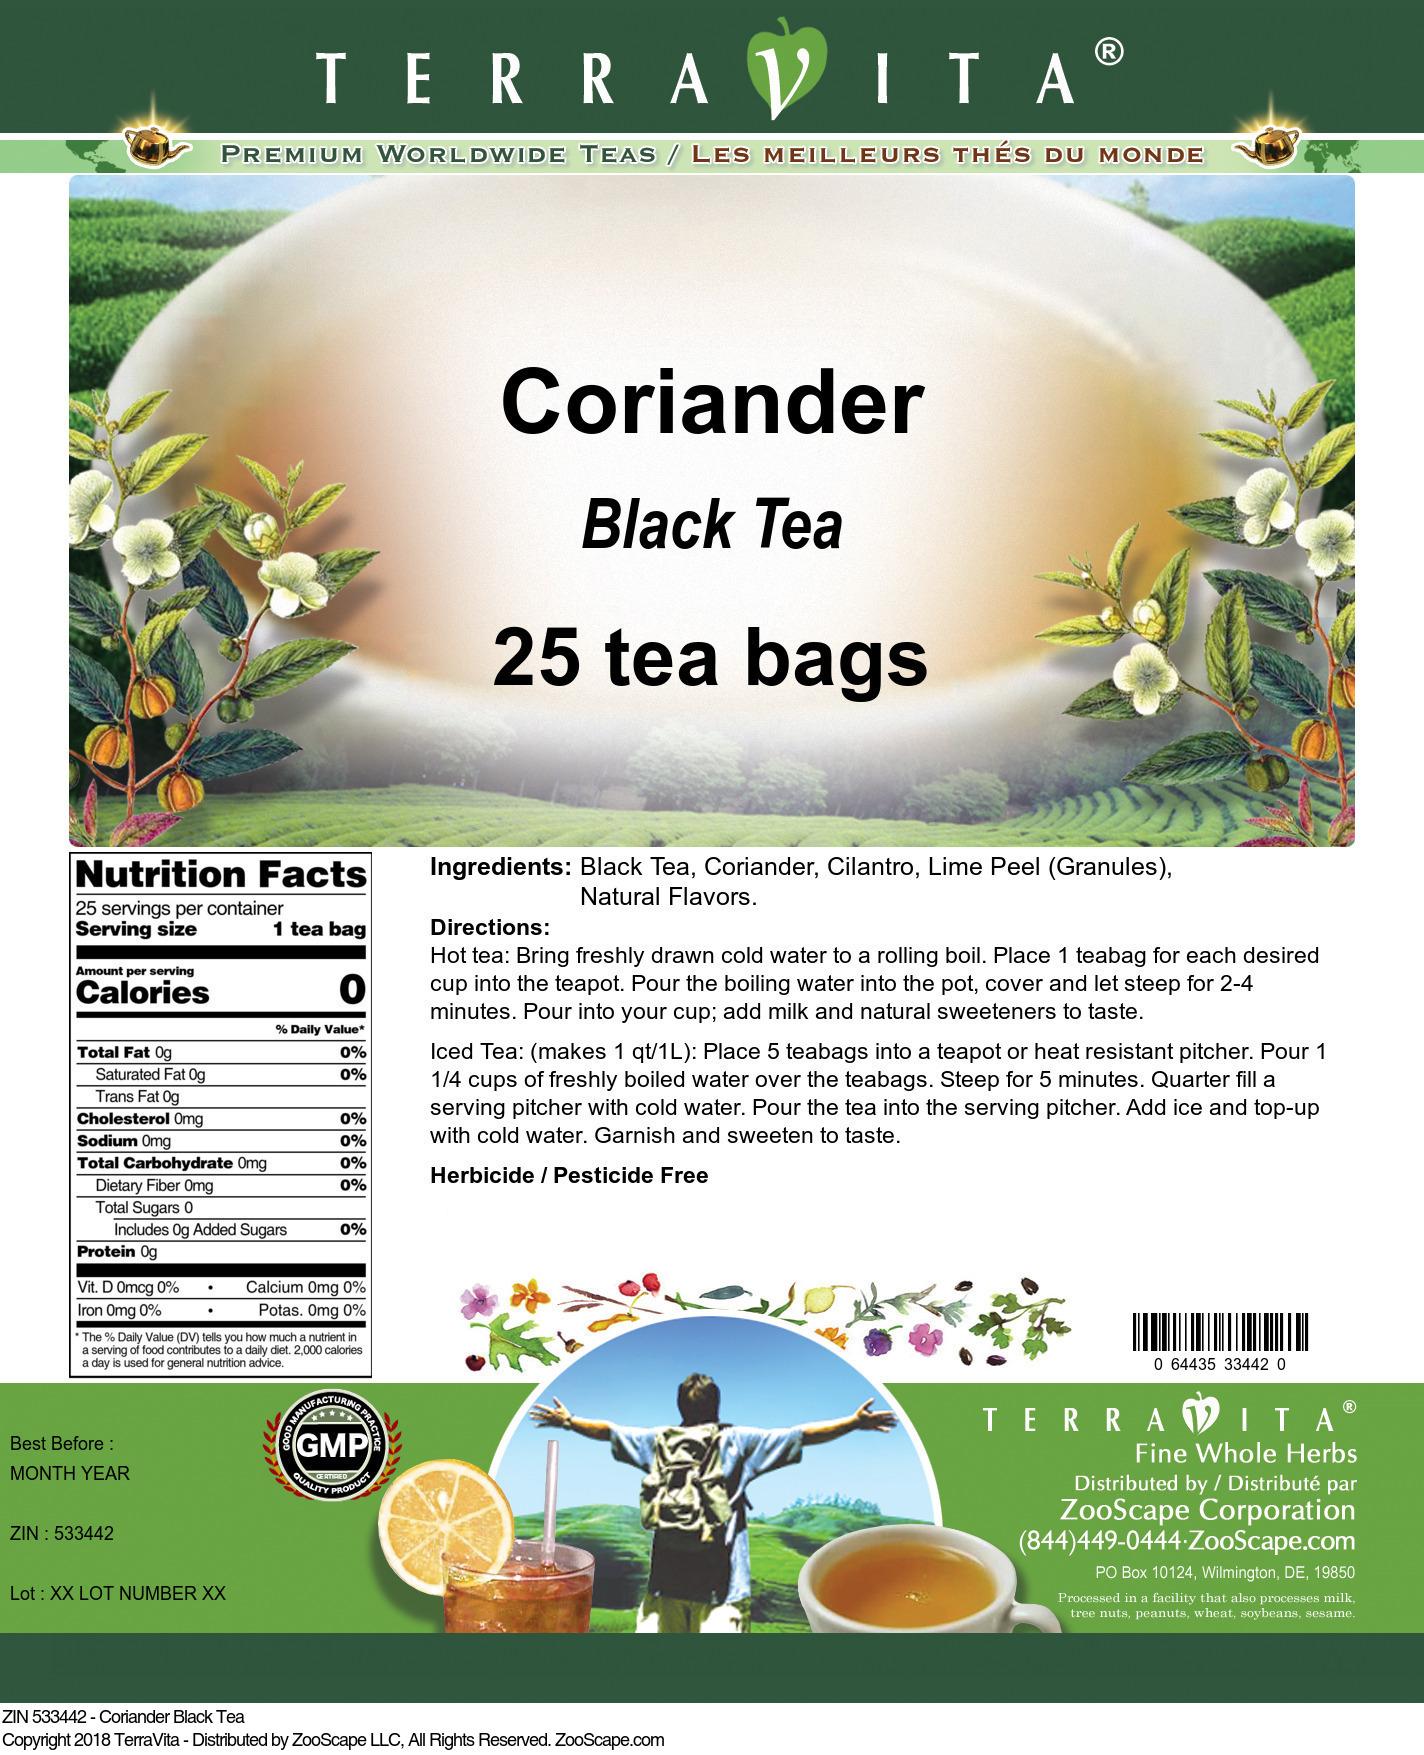 Coriander Black Tea